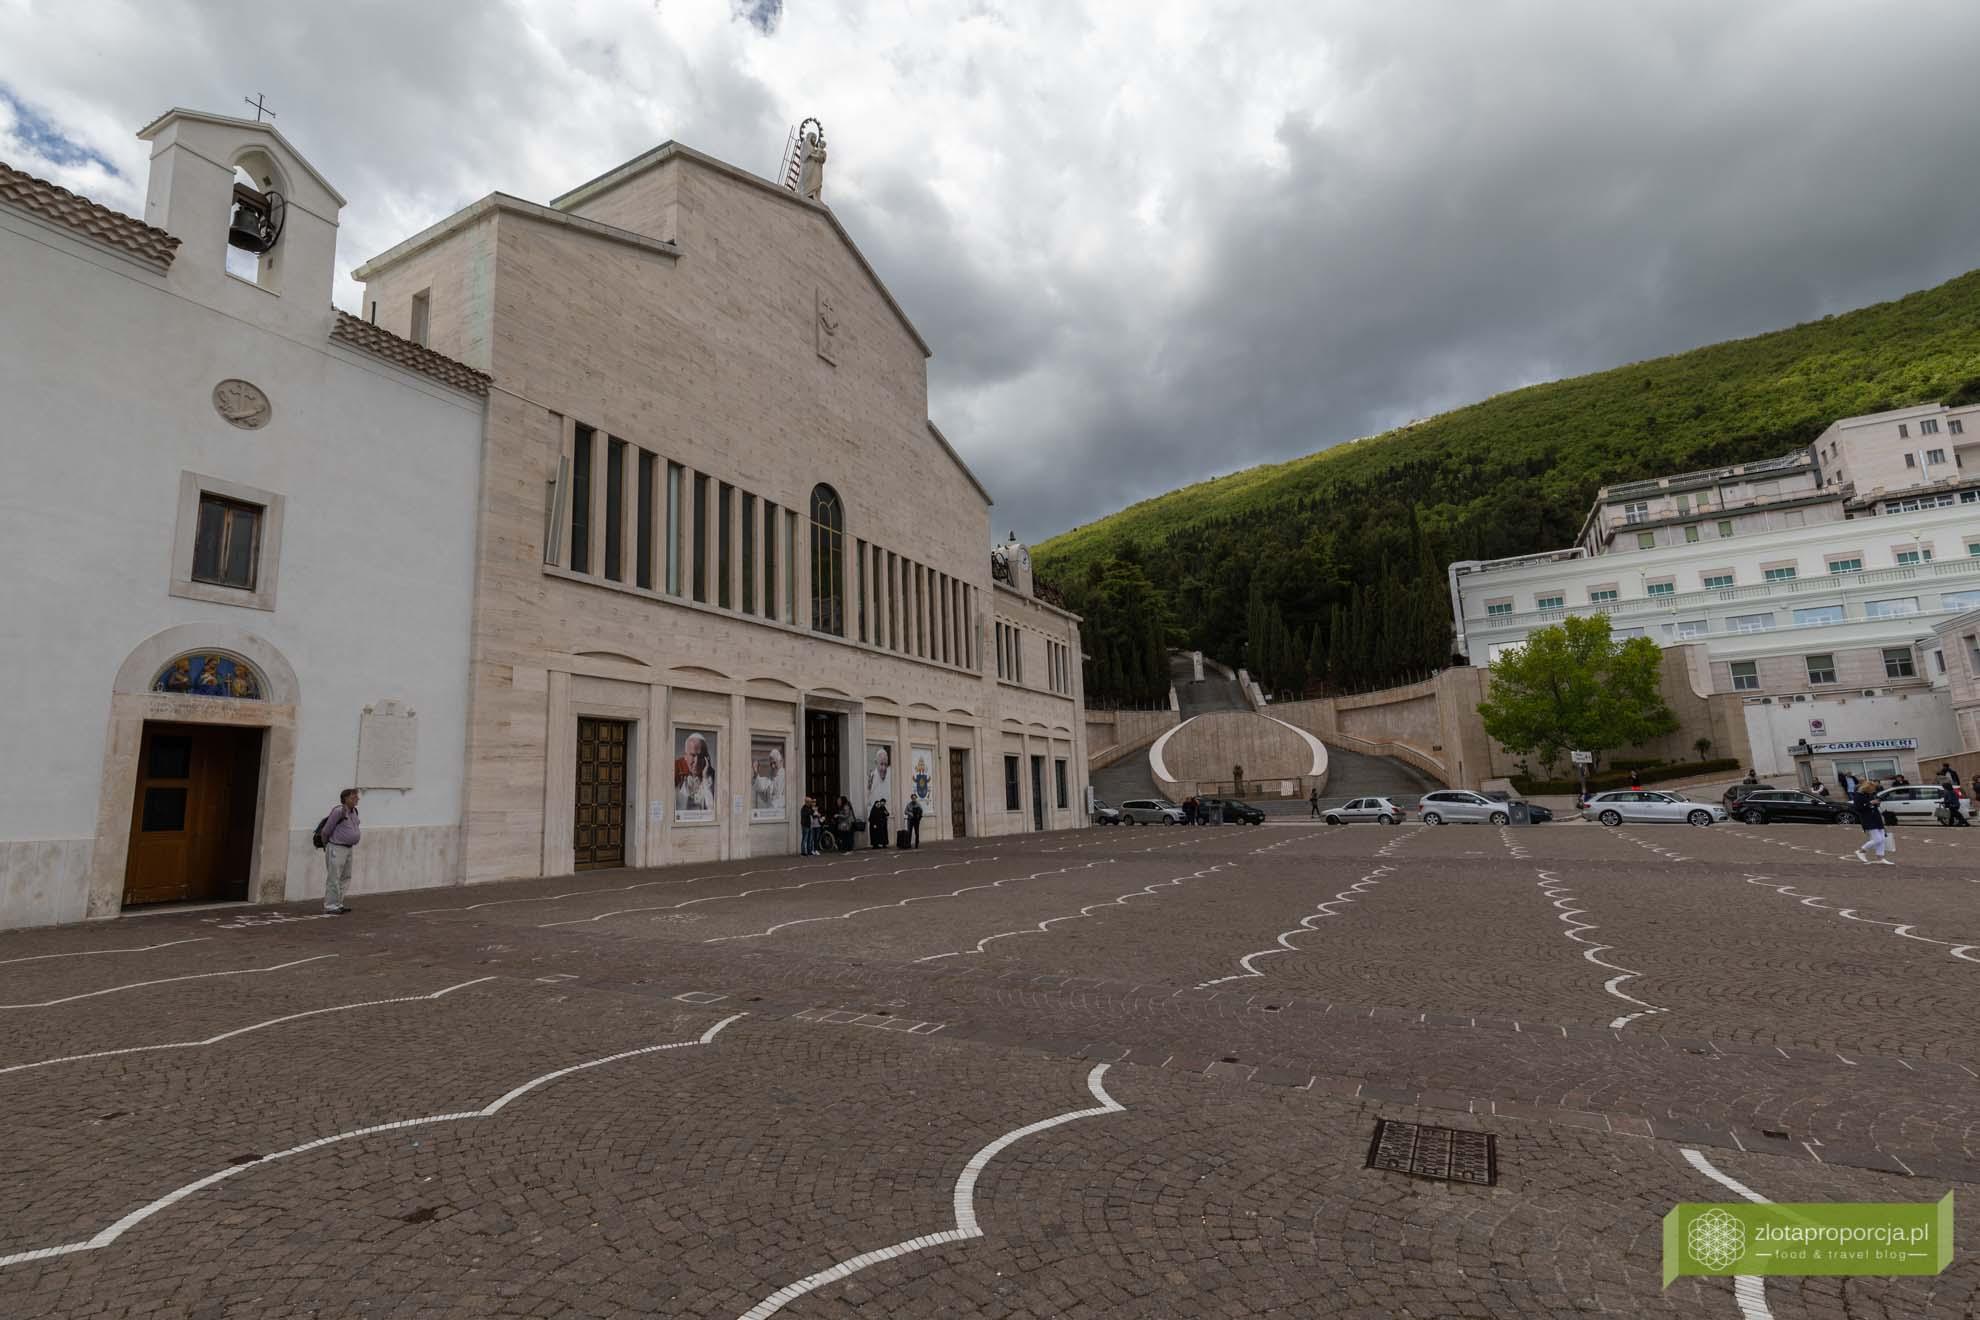 Gargano; Apulia; atrakcje Gargano; co zobaczyć na Gargano; atrakcje Apulii; San Giovanni Rotondo; Ojciec Pio;